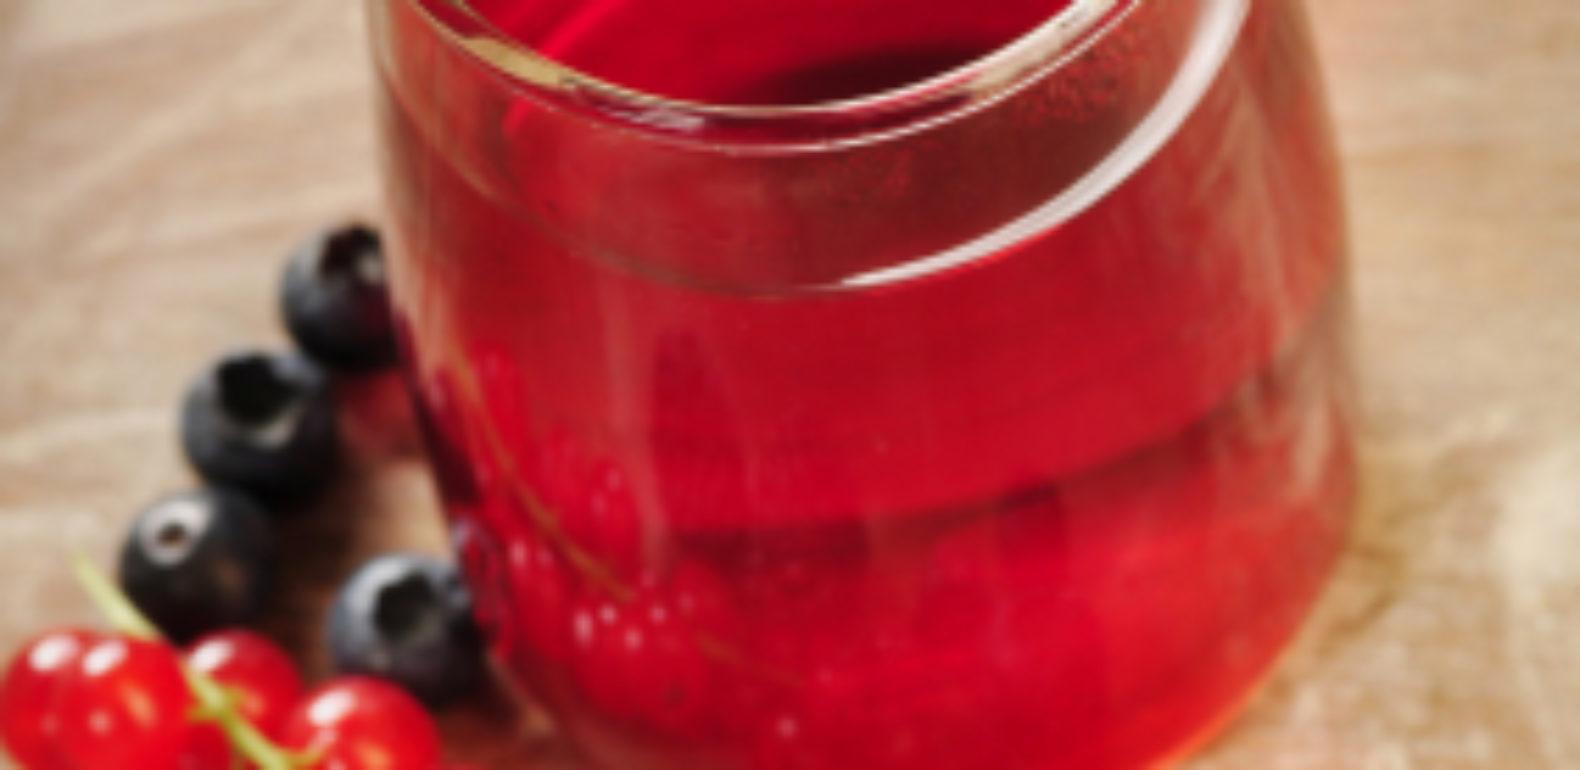 Hot Drink - renforcer son immunité